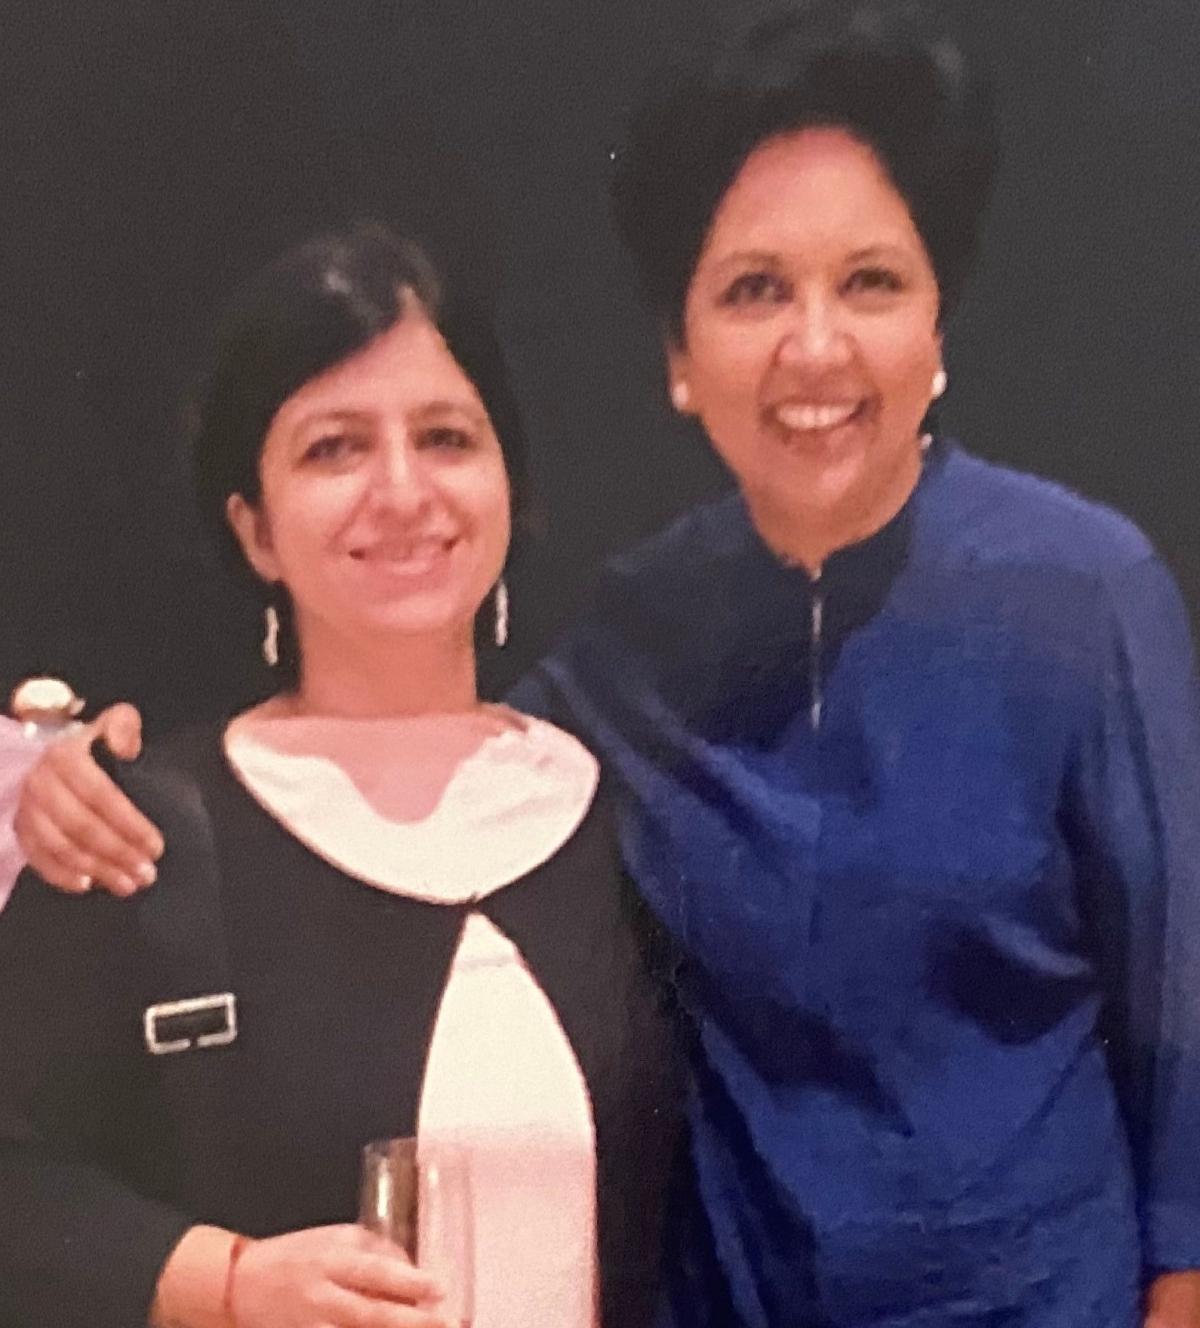 Poonam Kaul (L) with Indra Nooyi